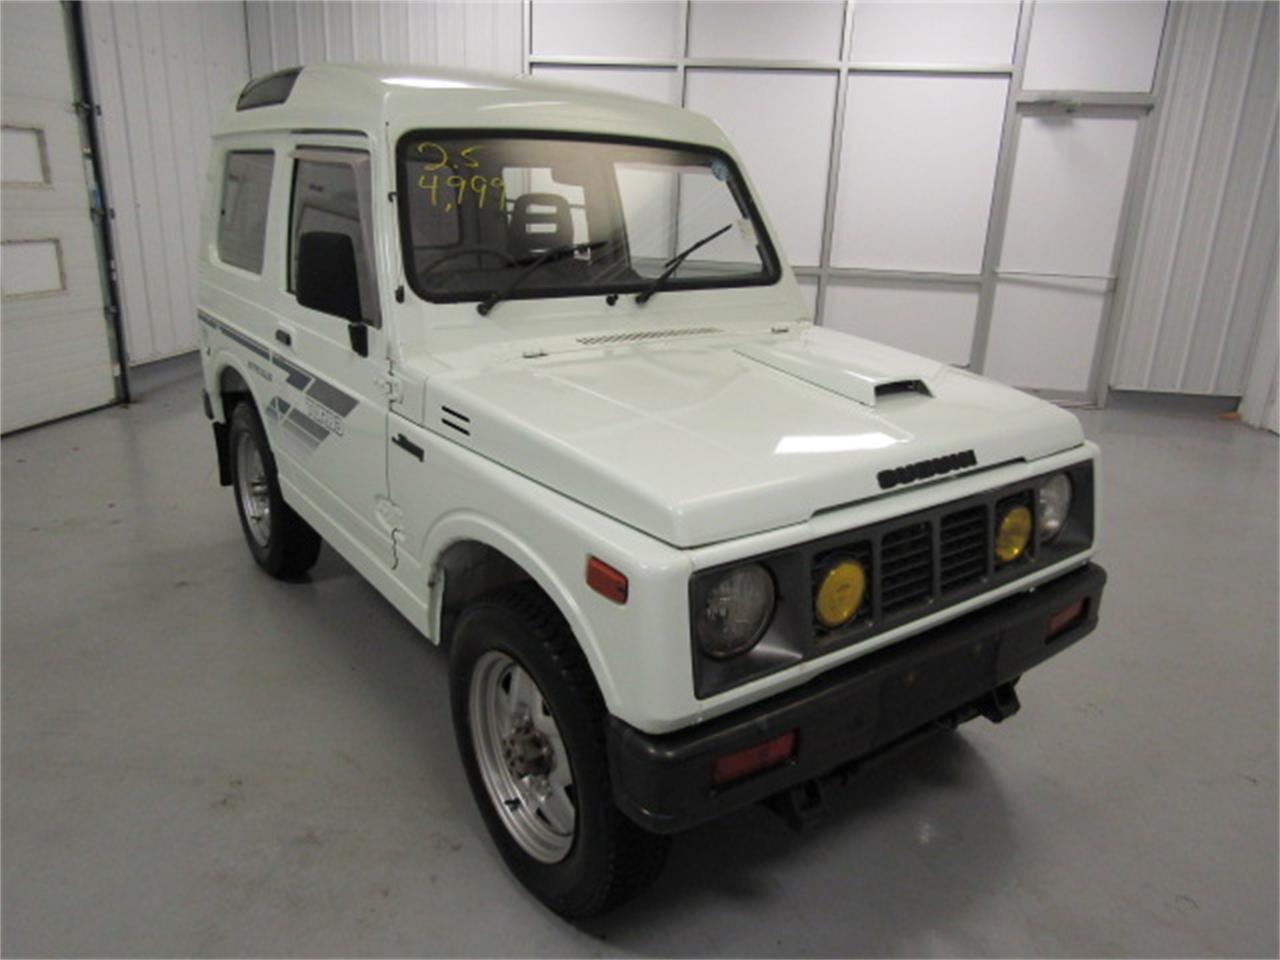 Large Picture of '87 Suzuki Jimmy - $3,999.00 - JM3N